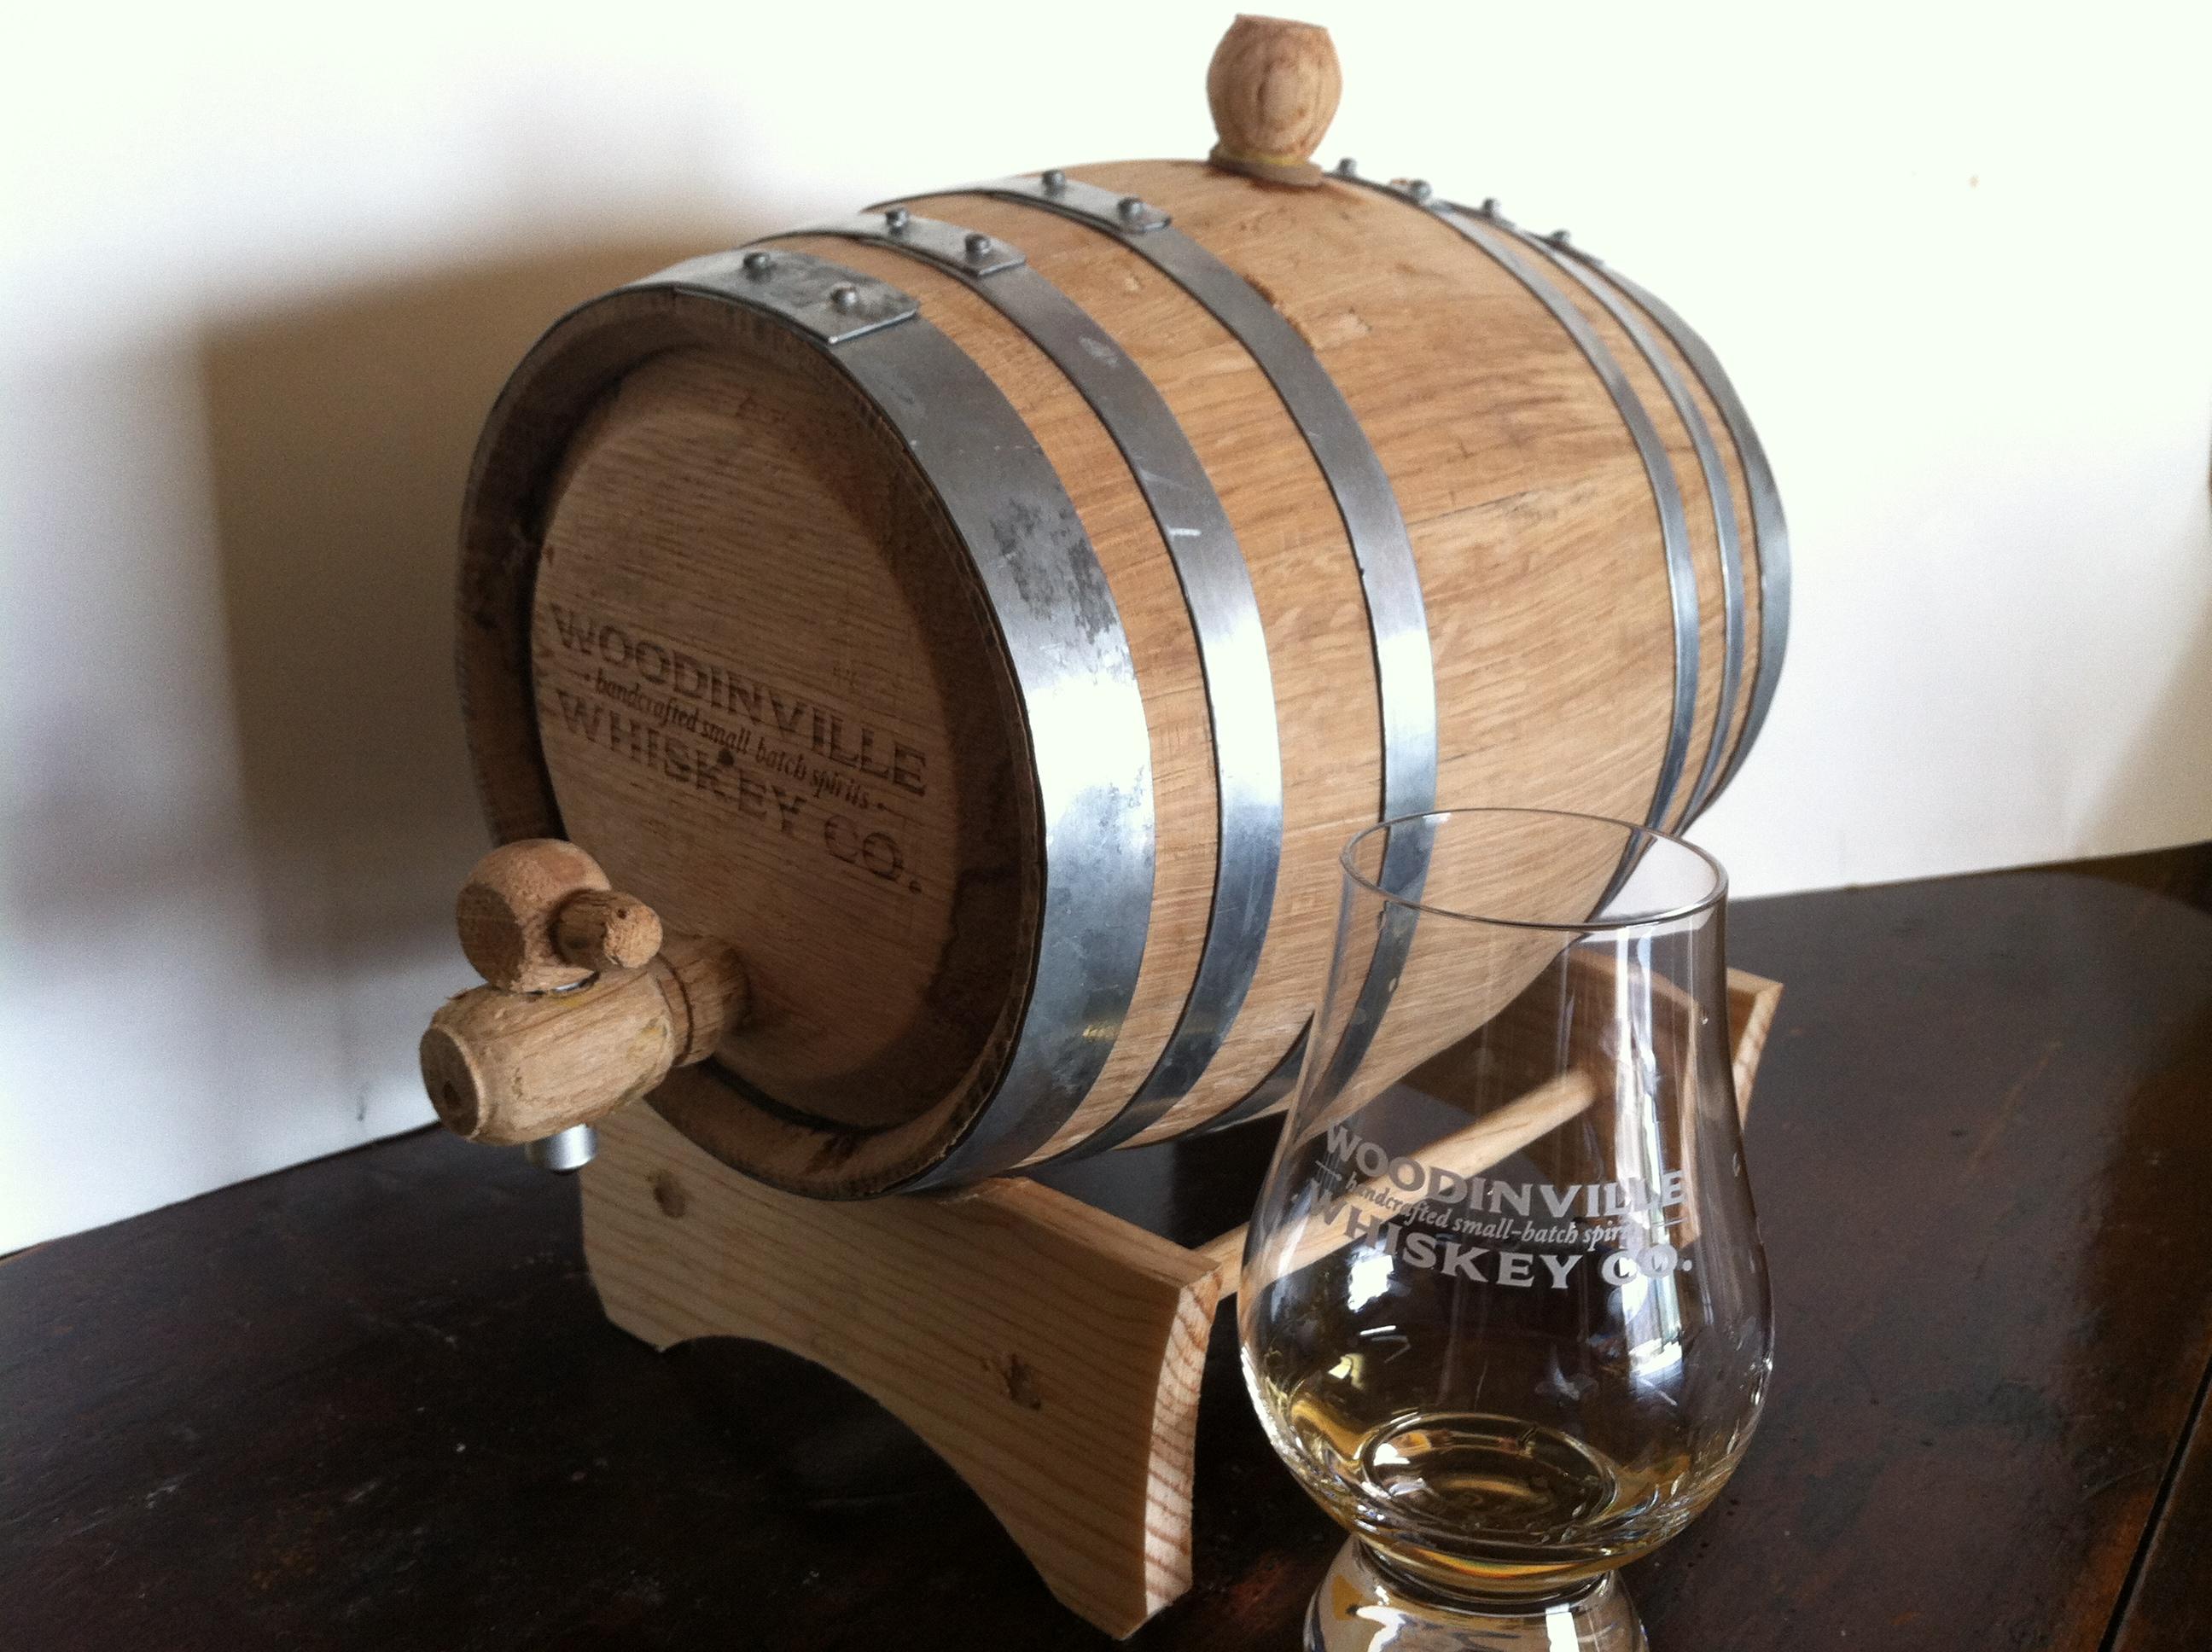 aged whiskey.JPG